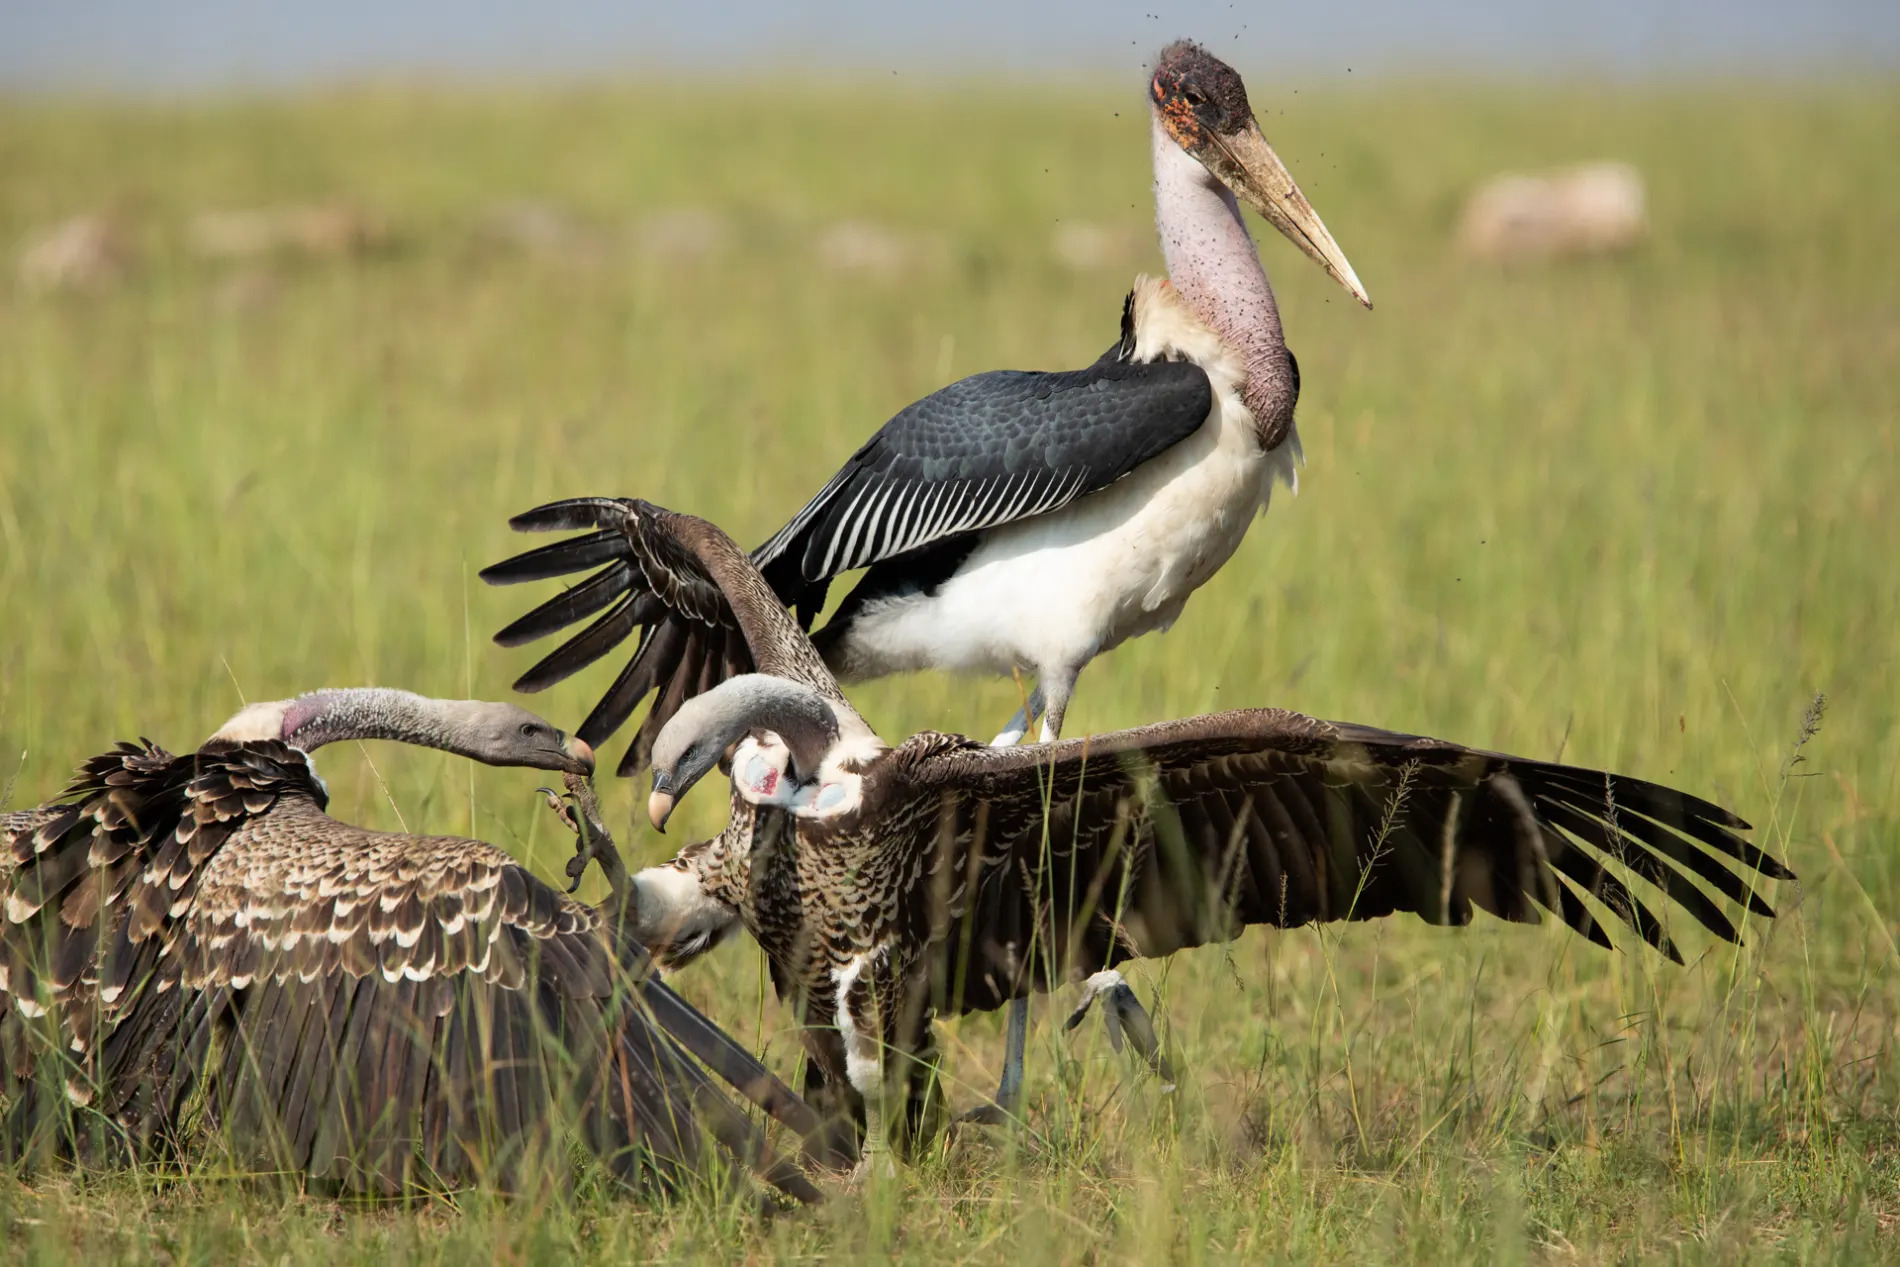 Vulture fight